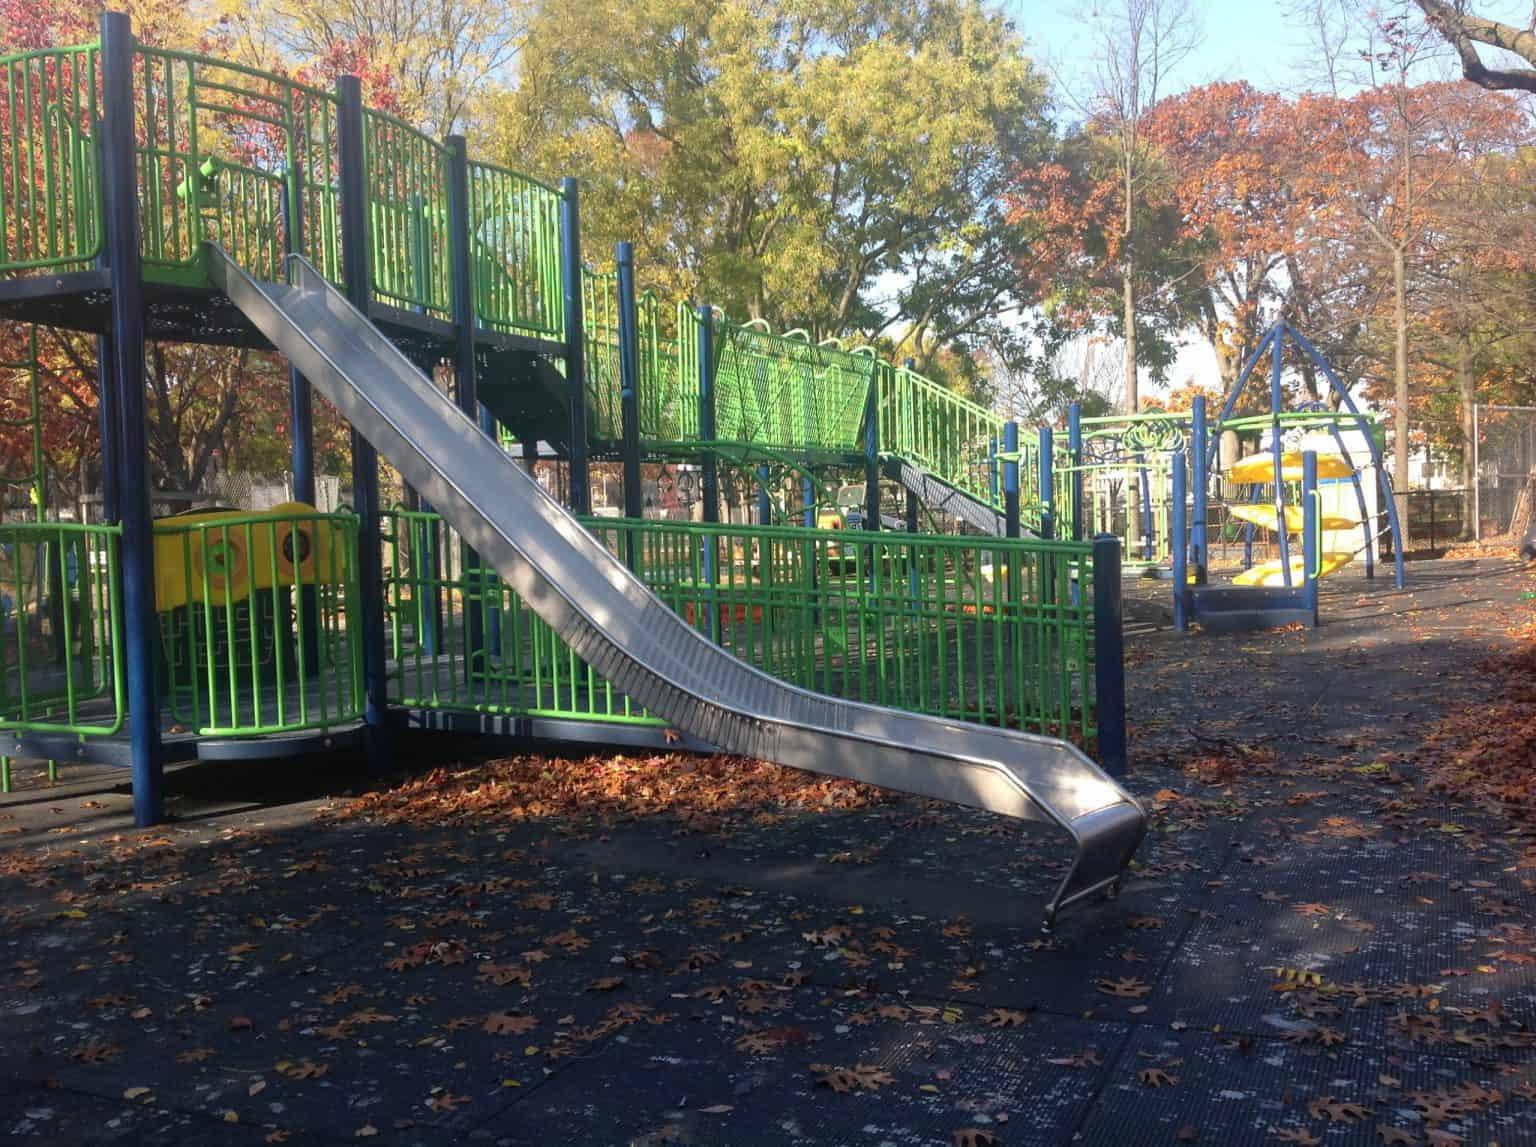 paerdegat-park-playground-brooklyn-ny_15310777114_o-scaled-e1587681195977-1536x1147